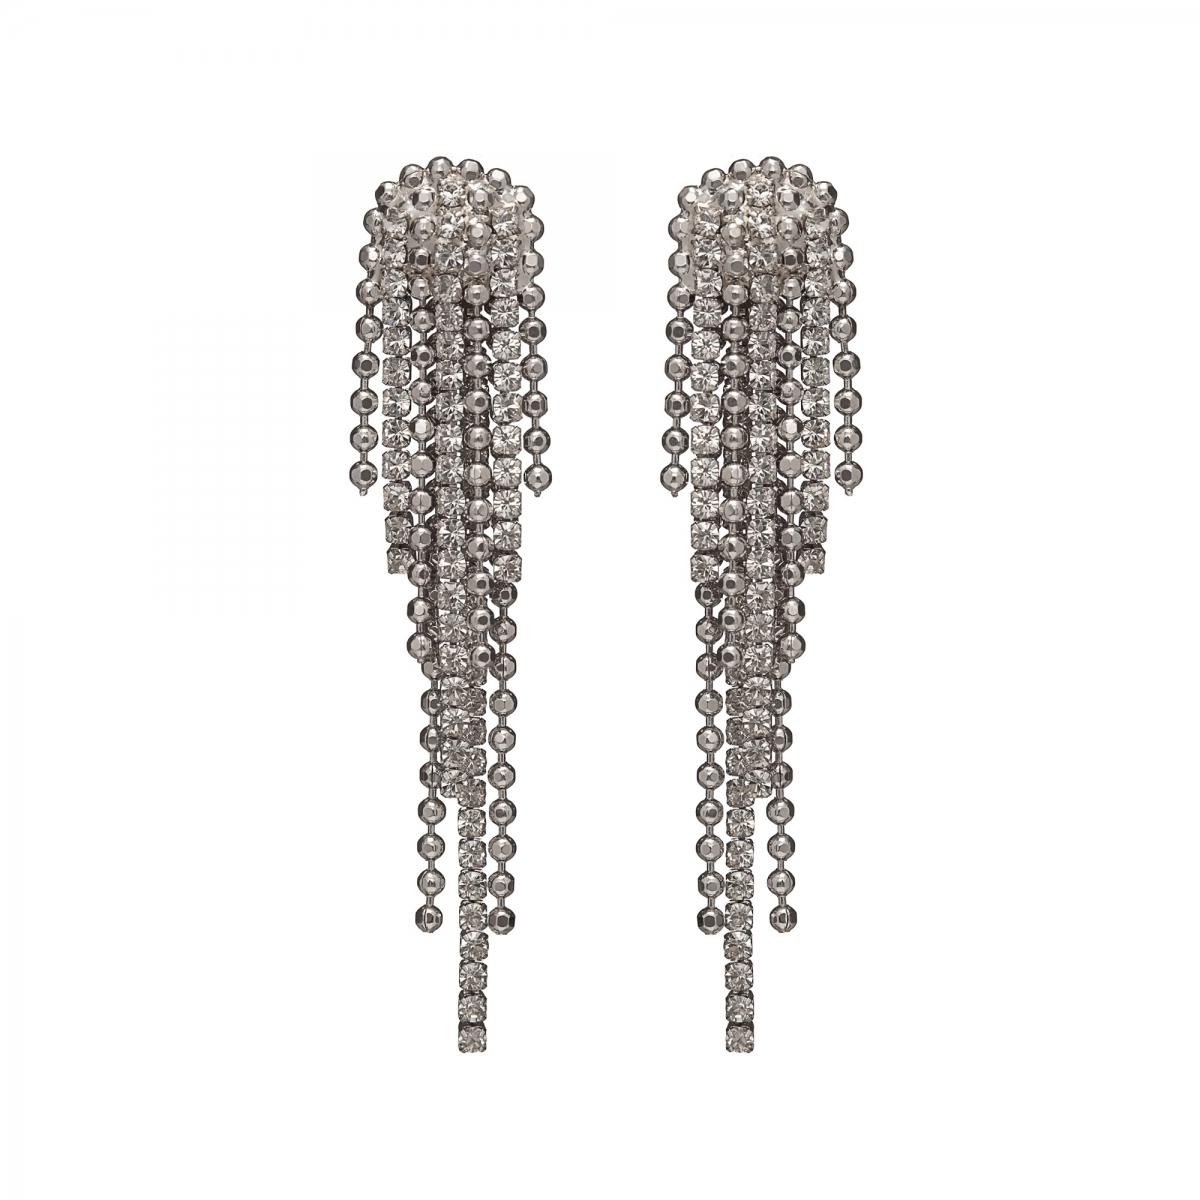 Náušnice Allison Exclusive Elegance Silver Crystals Shine